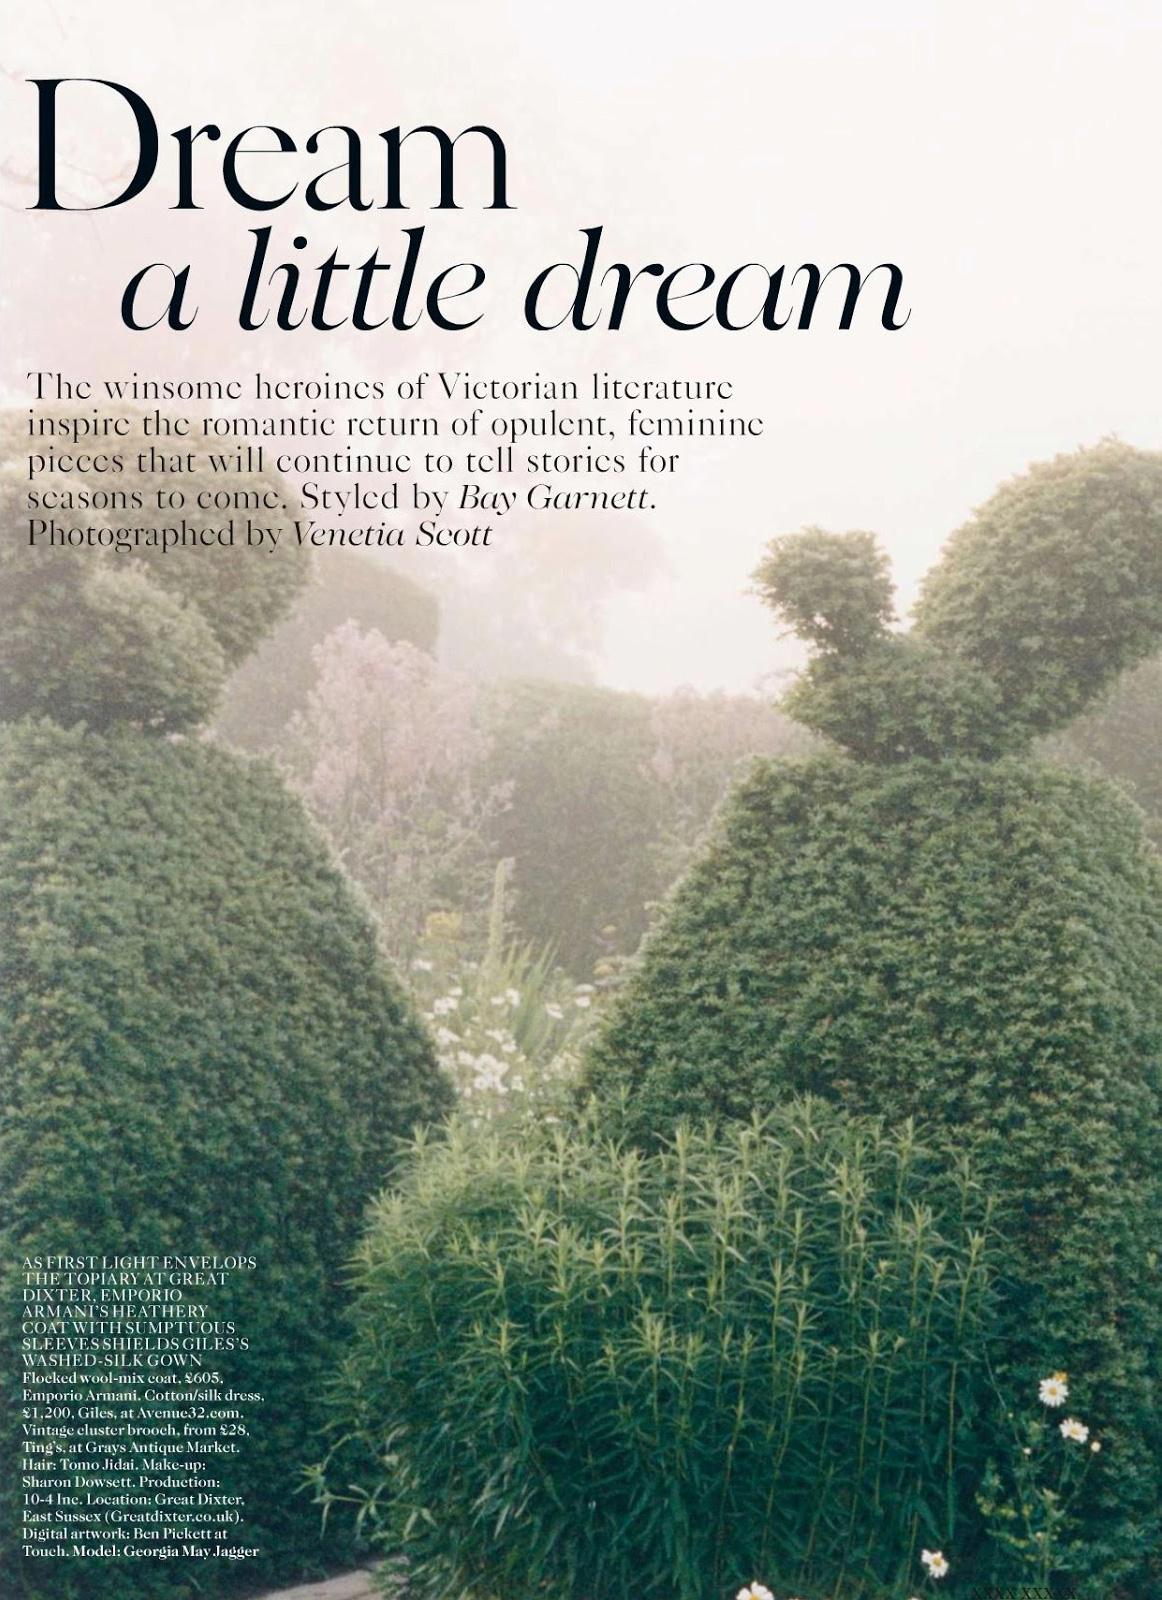 Dream a little dream Georgia May Jagger by Venetia Scott for Vogue UK October 2013 8